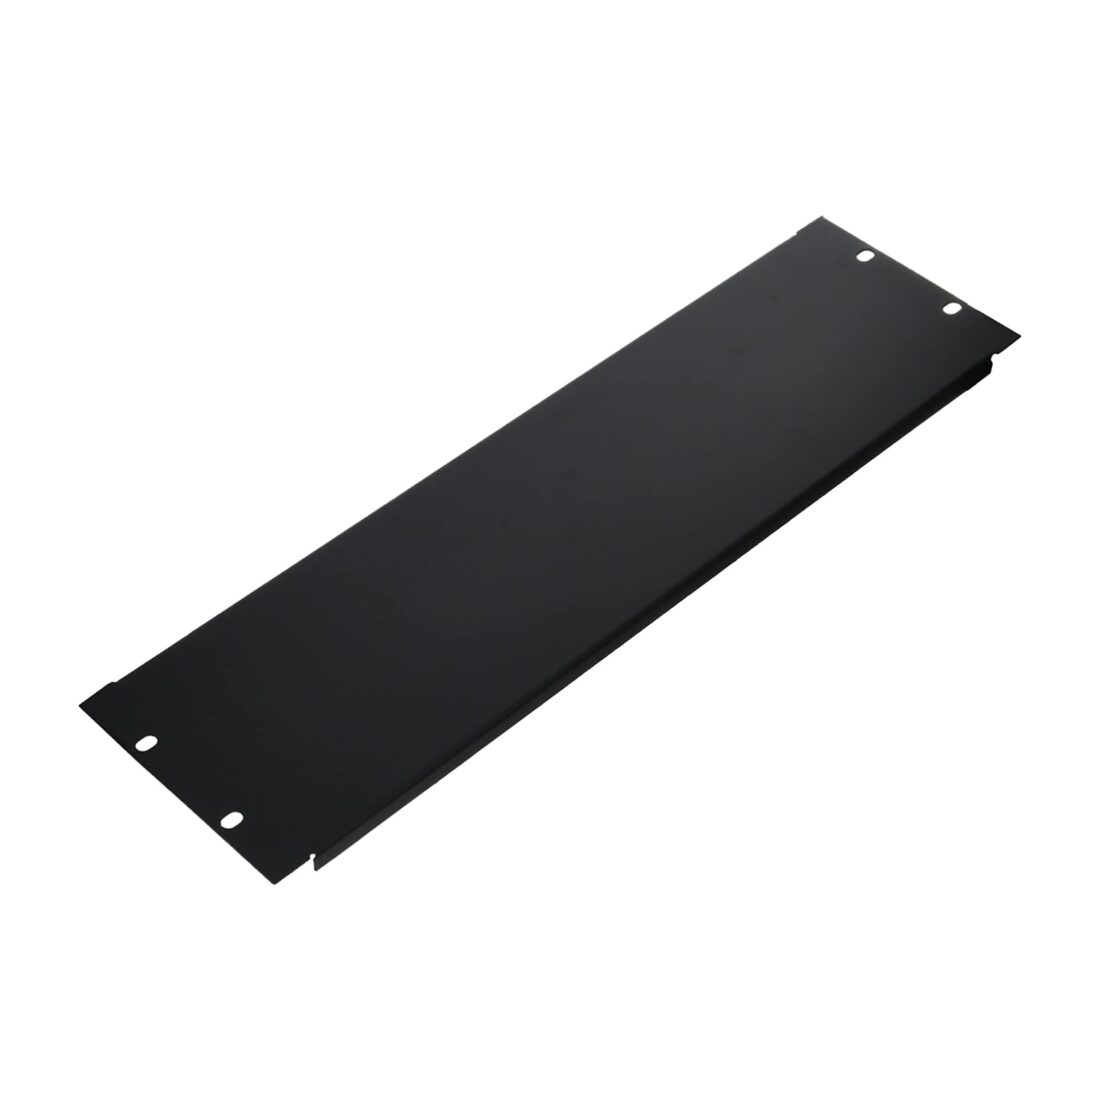 3u blank rack panel flanged